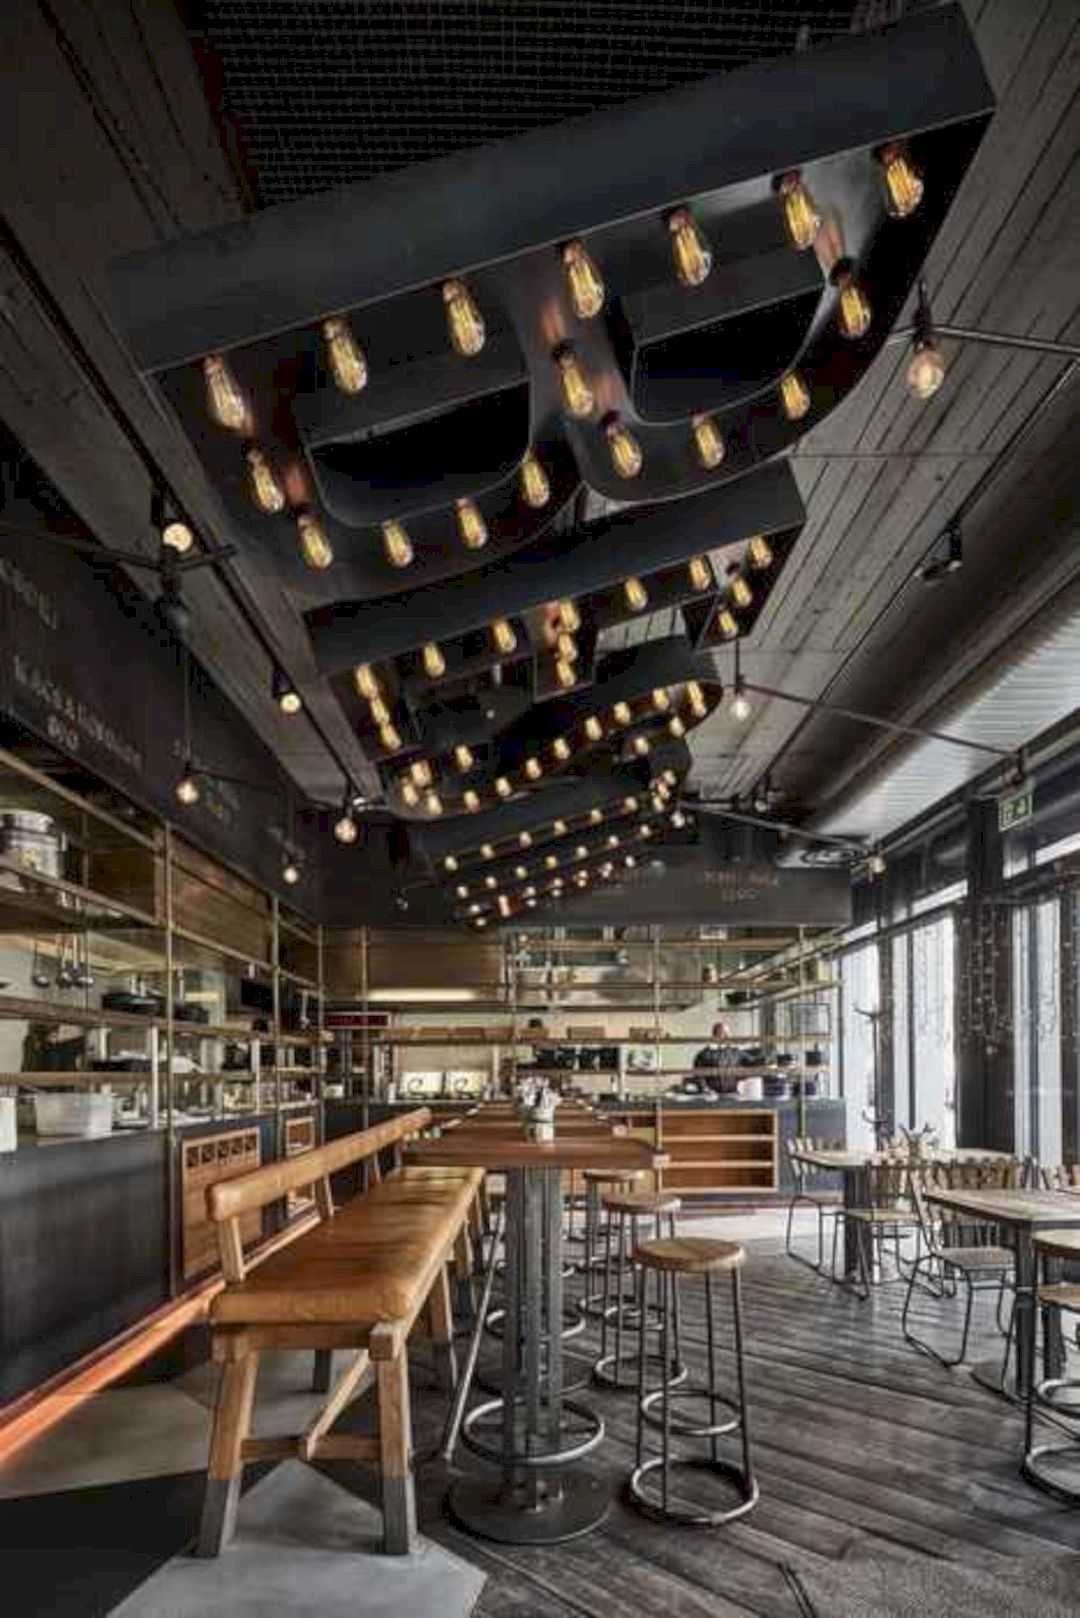 15 Amazing Bar Interior Design Ideas Bar Design Restaurant Bar Interior Design Bar Interior